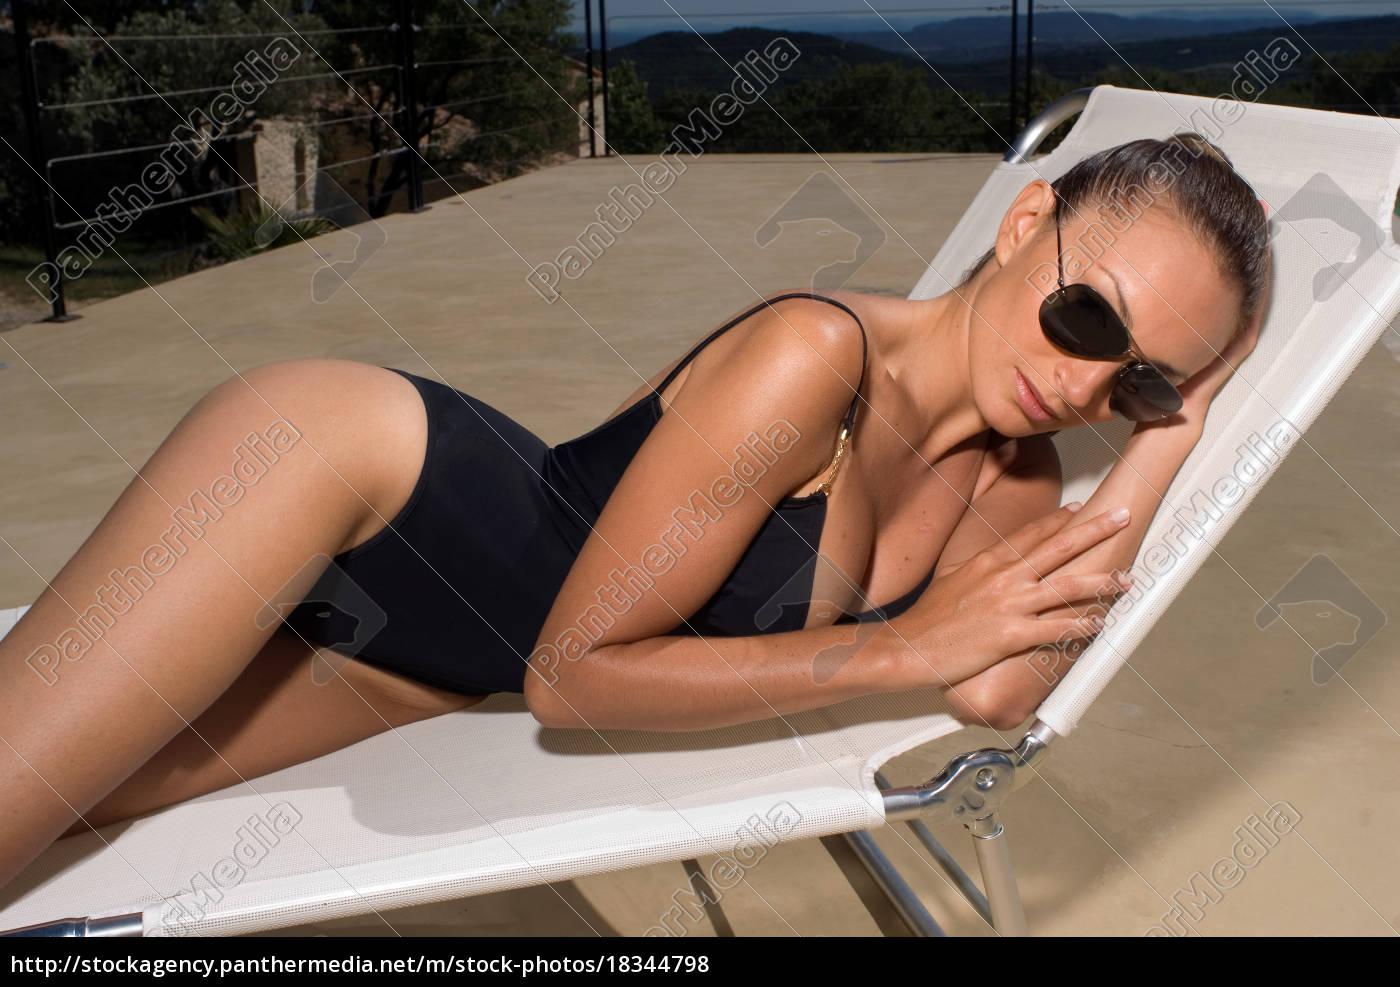 woman, sunbathing, by, a, swimming, pool - 18344798